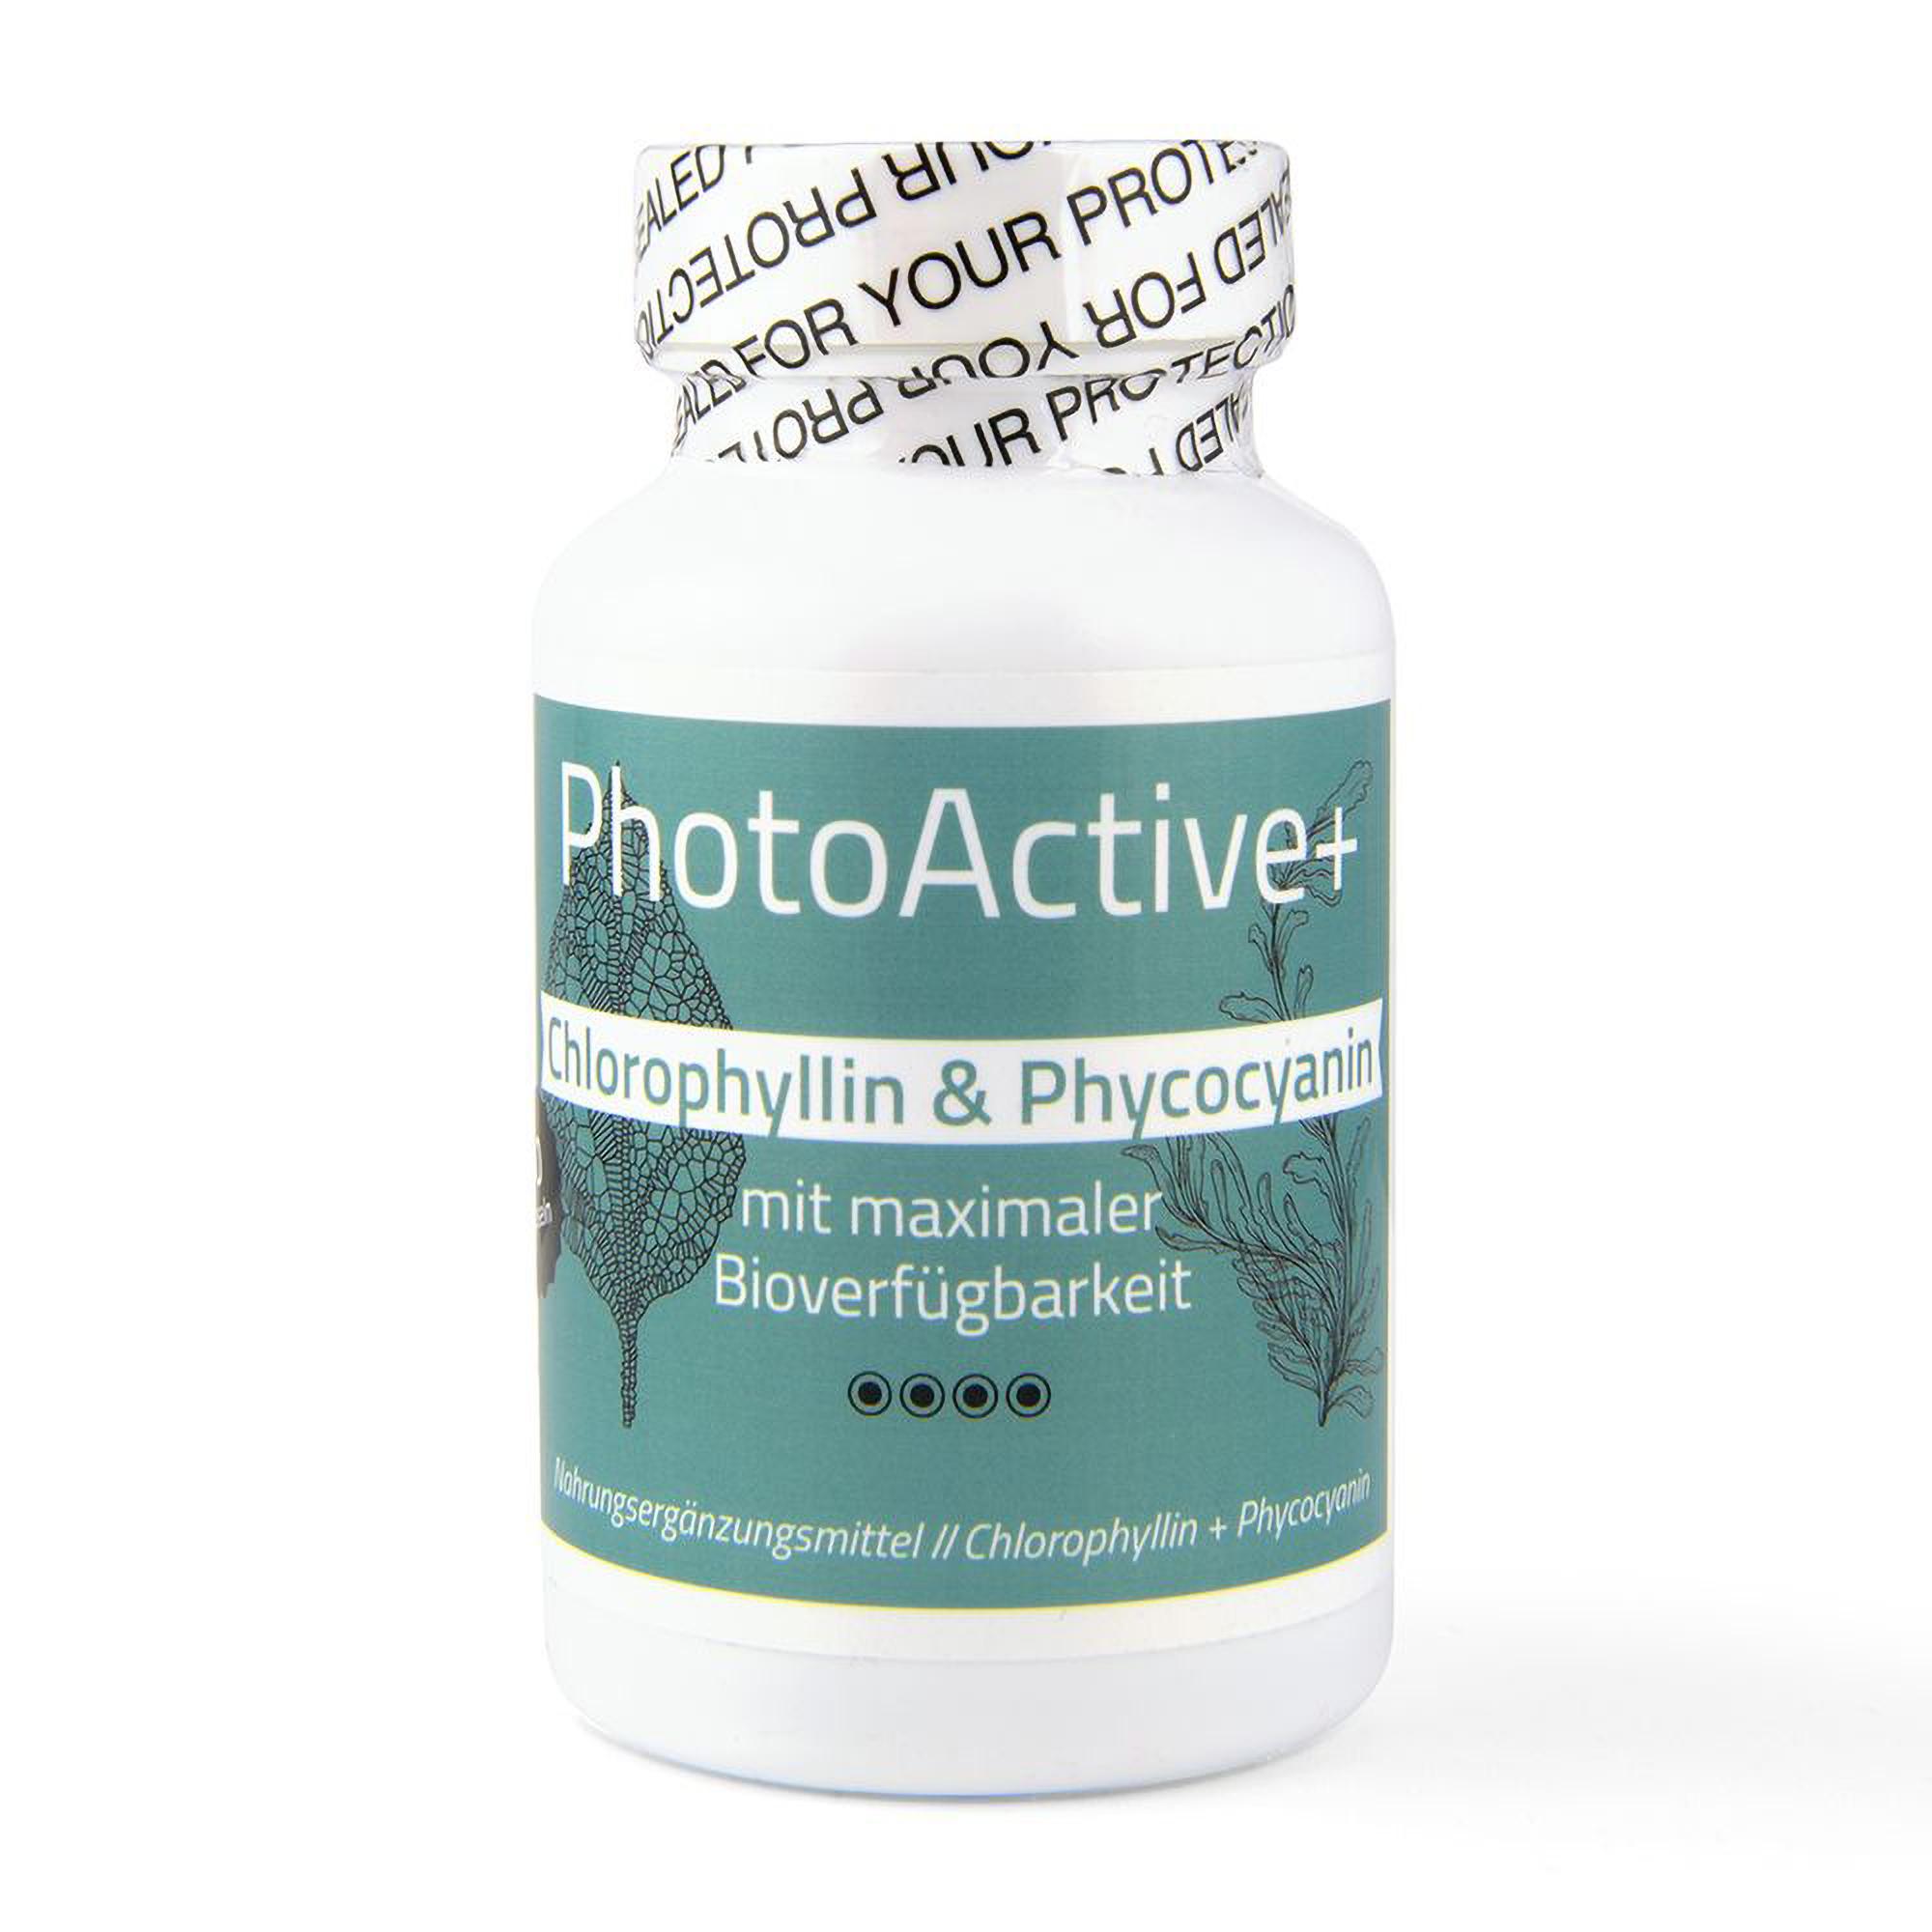 PhotoActive+